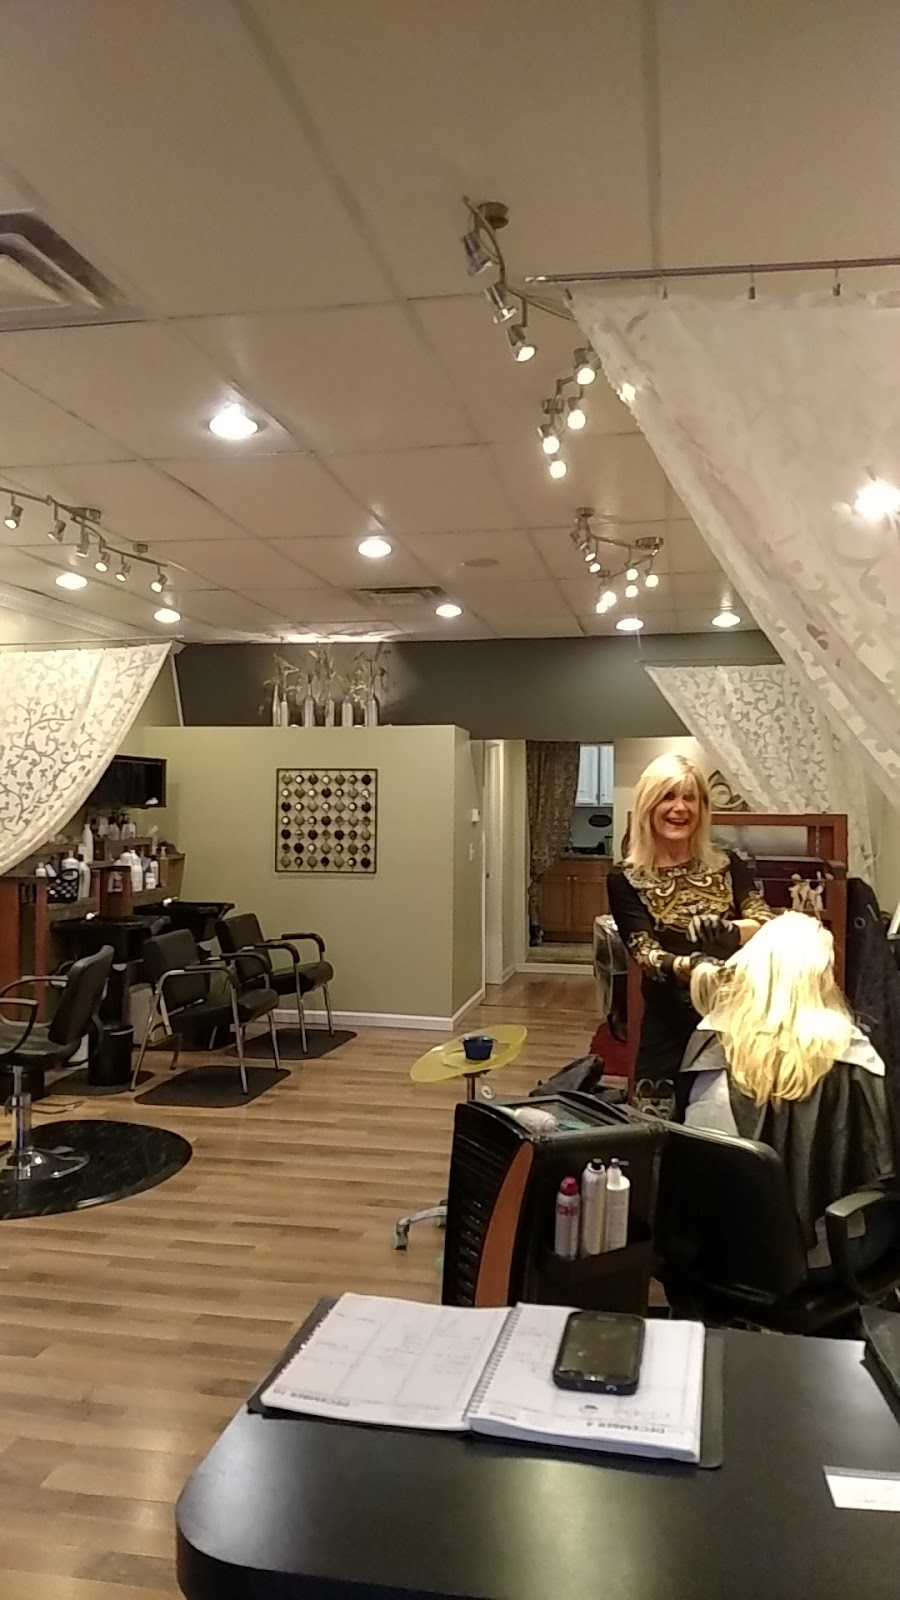 Full Circle Salon - hair care  | Photo 1 of 1 | Address: 6606 Lincoln Ave, Lockport, NY 14094, USA | Phone: (716) 438-0608